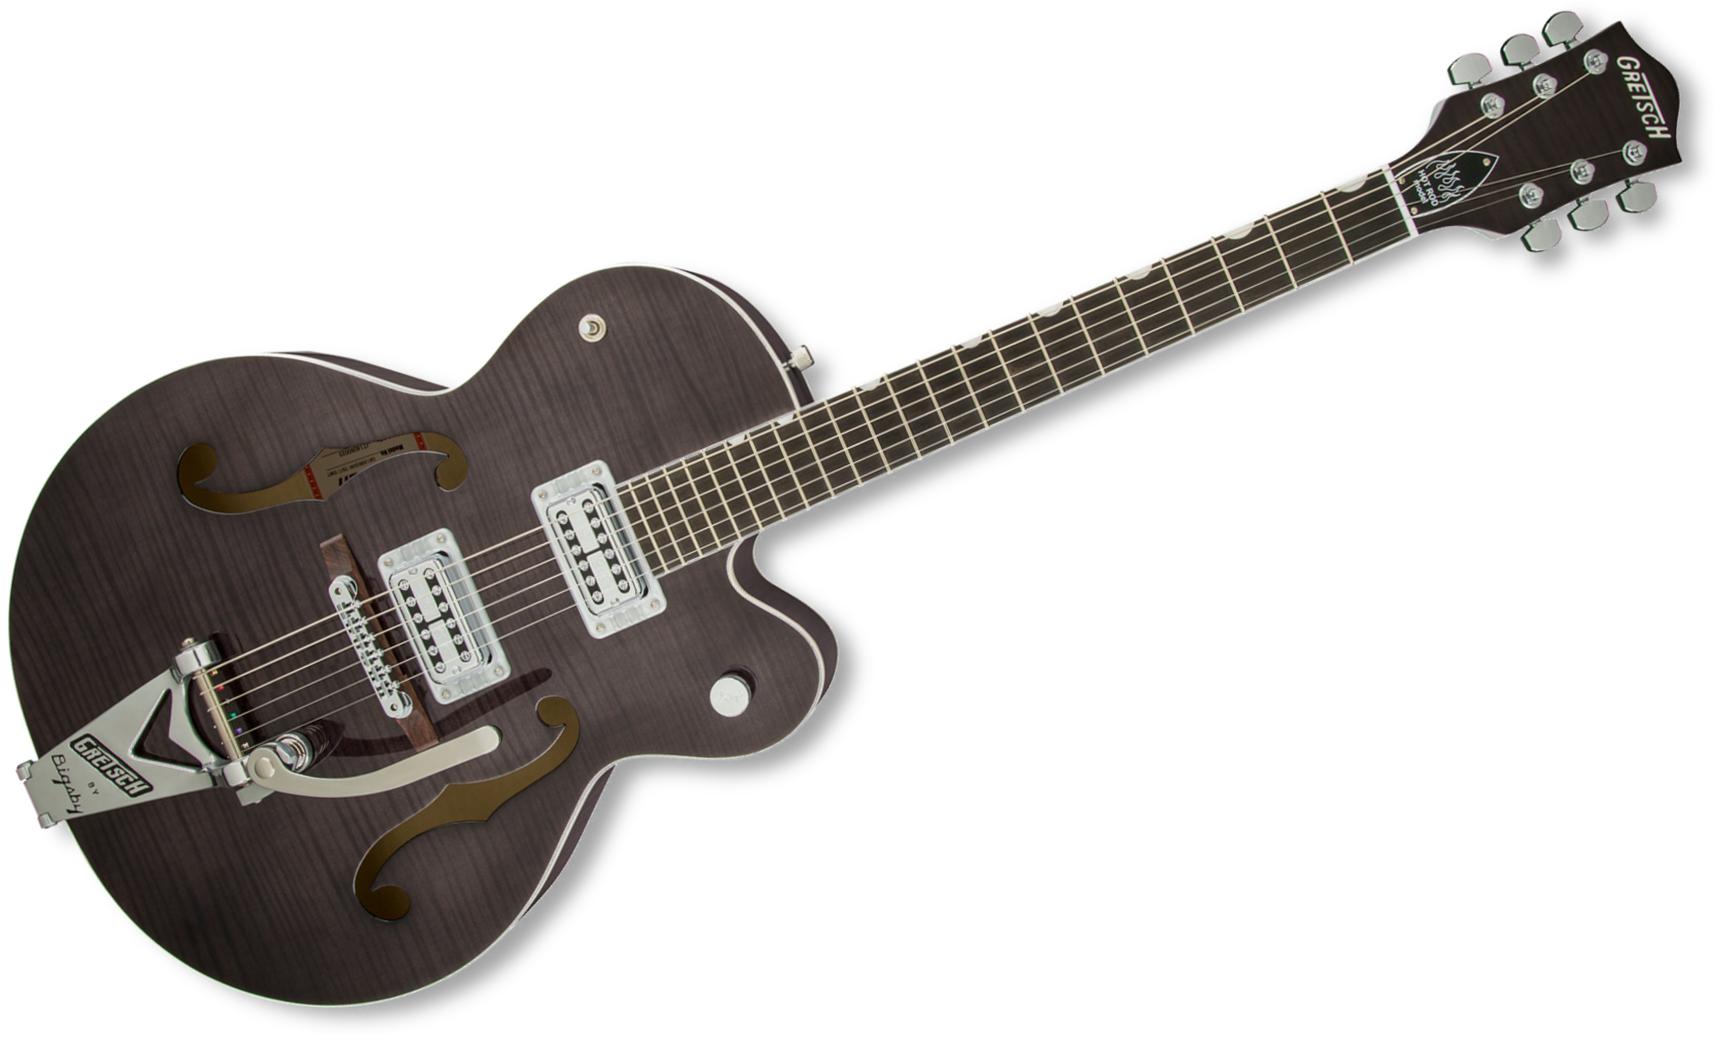 Gretsch Guitars G6120SH-TBLK [DISPLAY MODEL] Brian Setzer Hot Rod Hollow Body Electric Guitar, Tuxedo Black G6120SH-TBLK-DIS